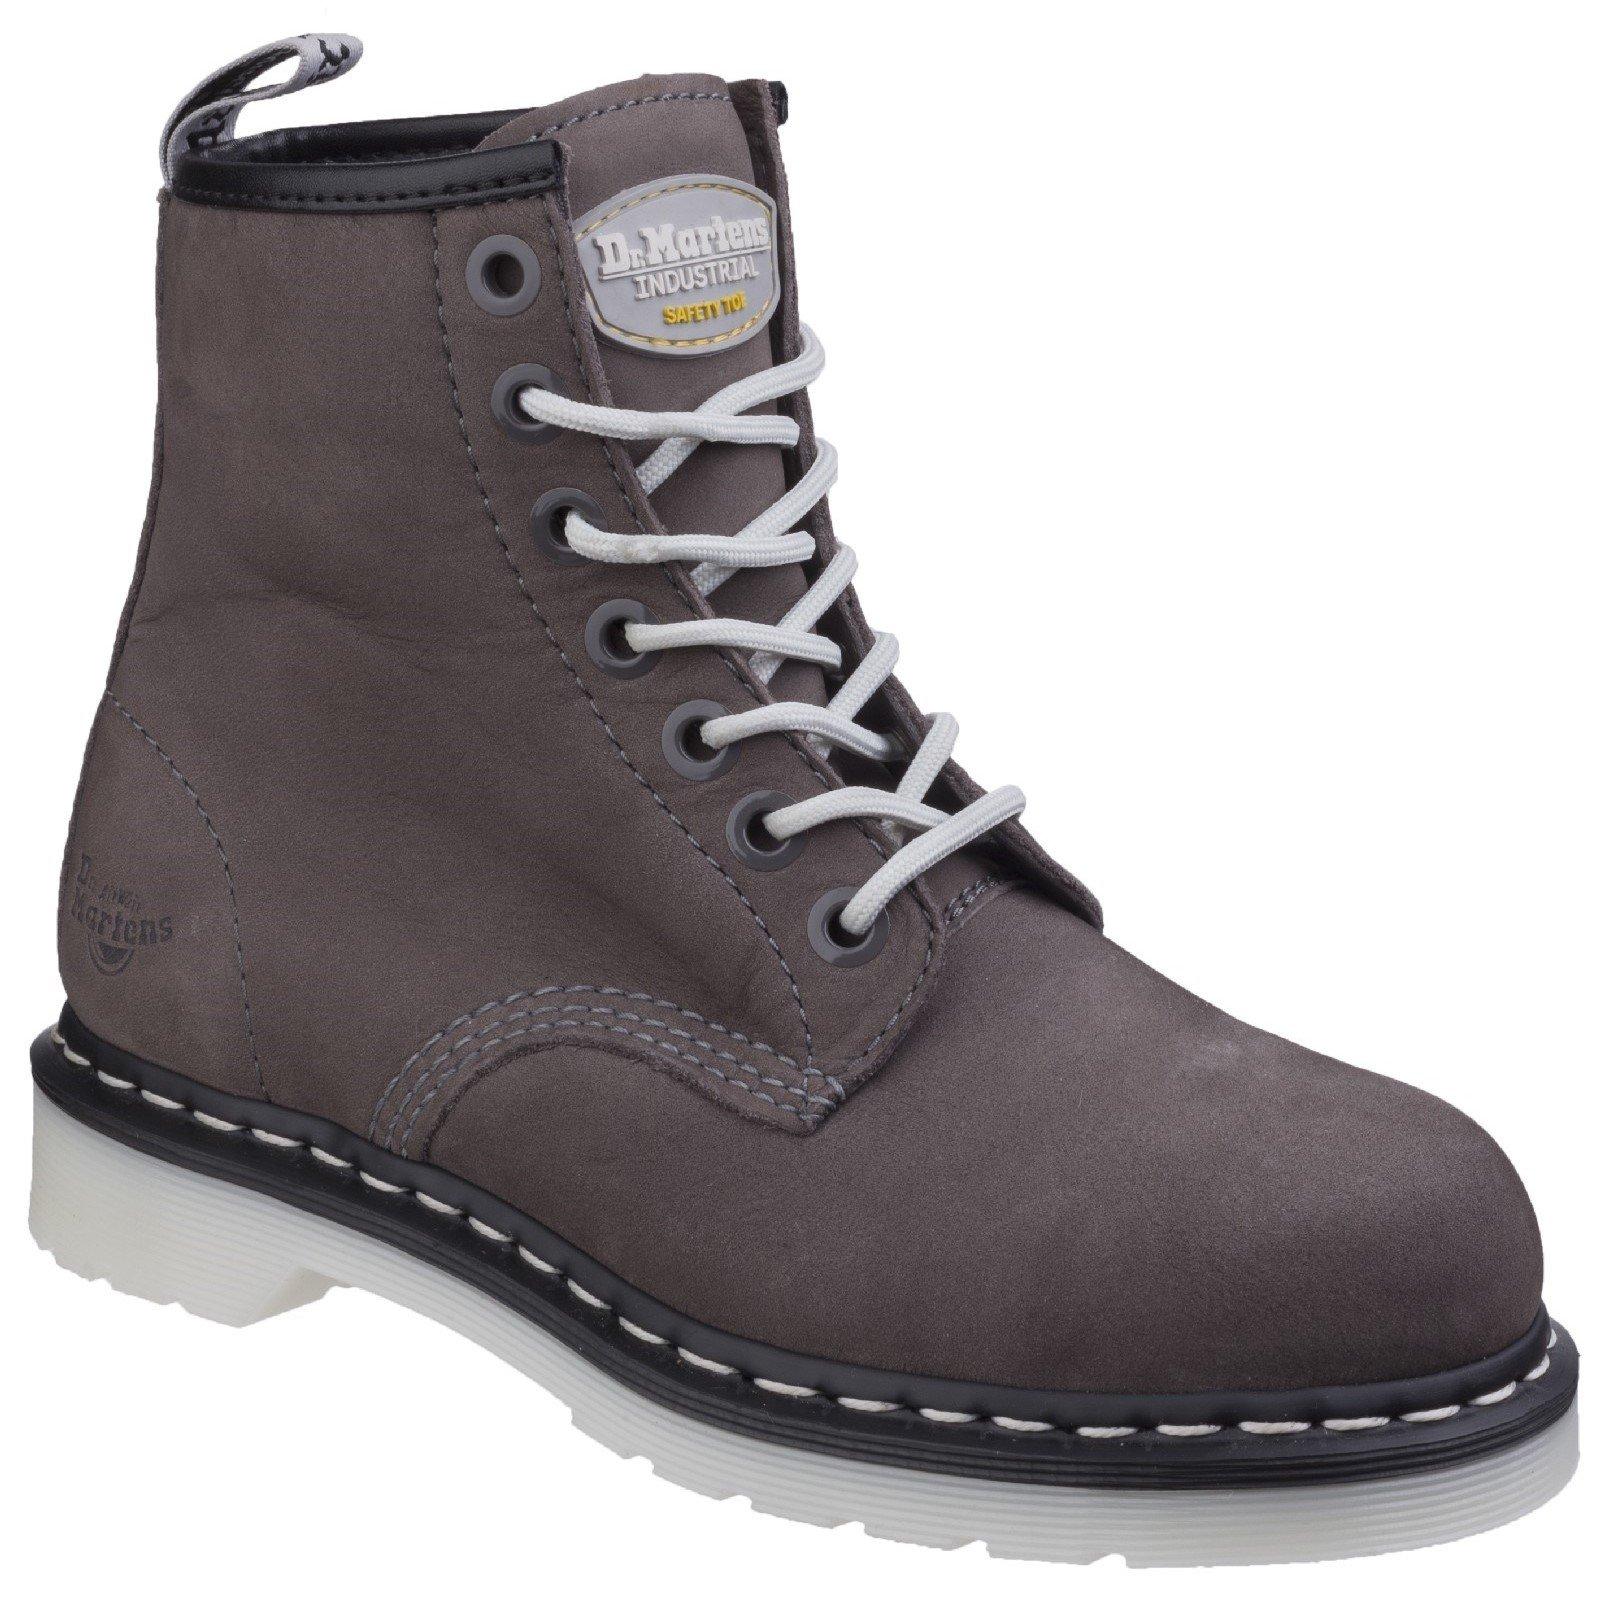 Dr Martens Women's Maple Classic Steel-Toe Work Boot Grey 26783 - Grey Wind River 4